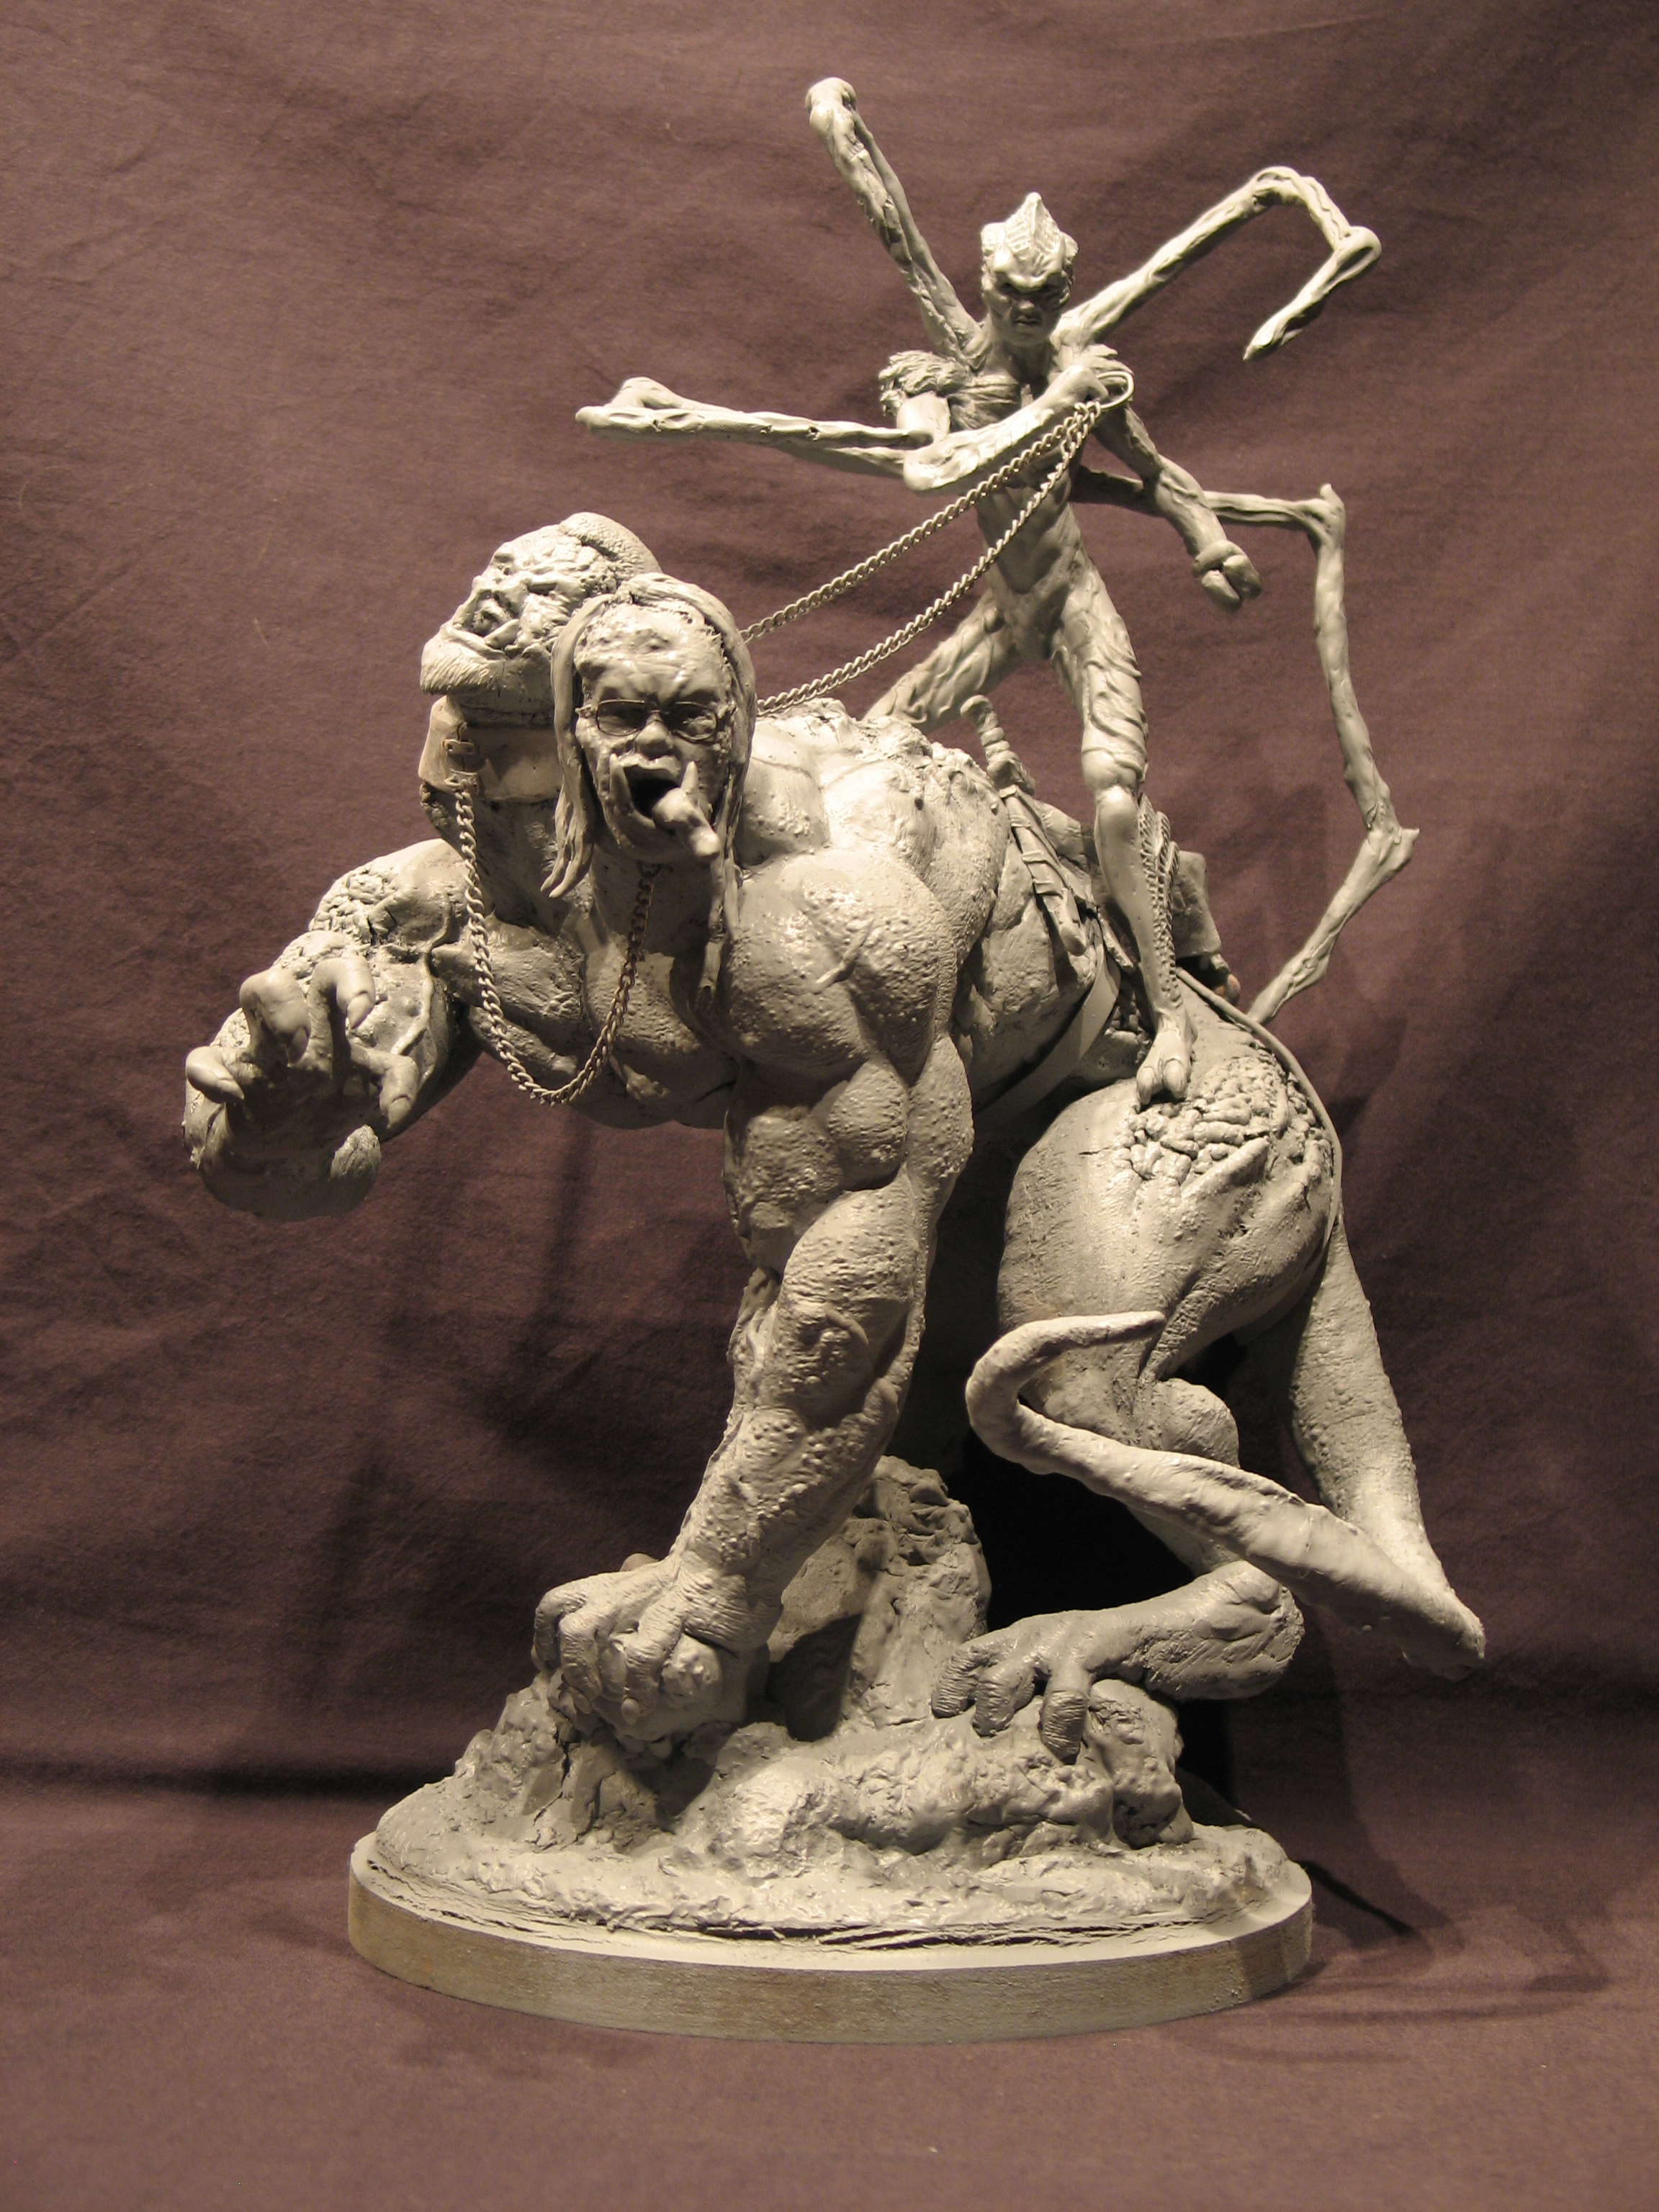 Spiderzero Riding the Shiflett Monster (Concours Shiflett 2) S129